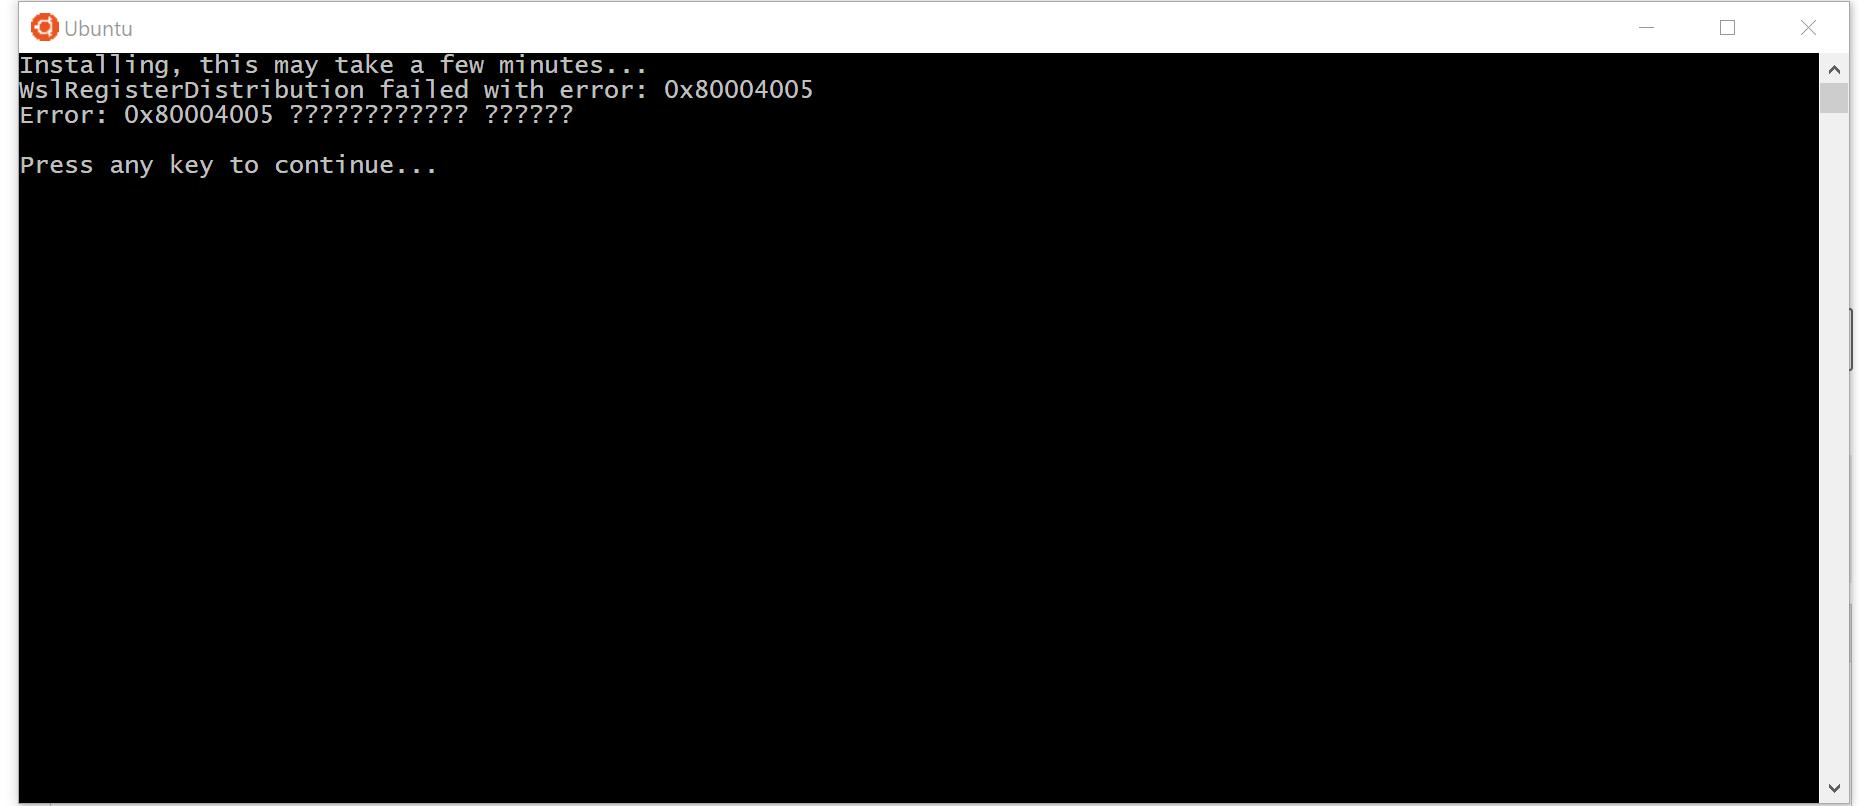 WslRegisterDistribution failed with error 0x8007019e and 0x8000000d – WSL 14894248-111d-412b-8af4-855ec595eda1?upload=true.png